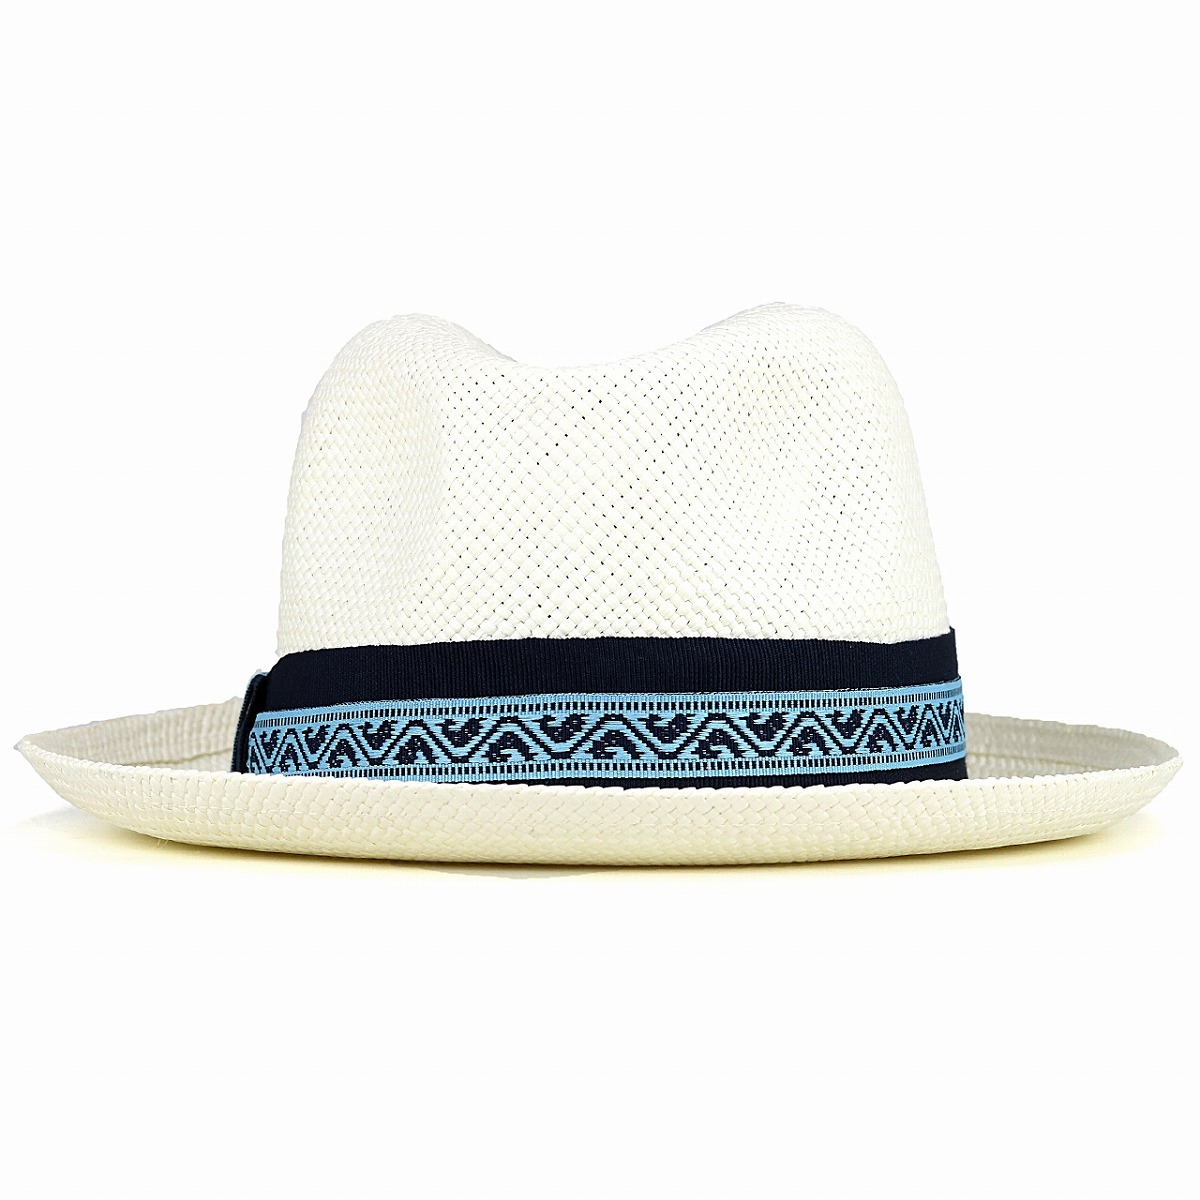 b4a13fdbc24 Greg Bourdy White Panama Hat Mens